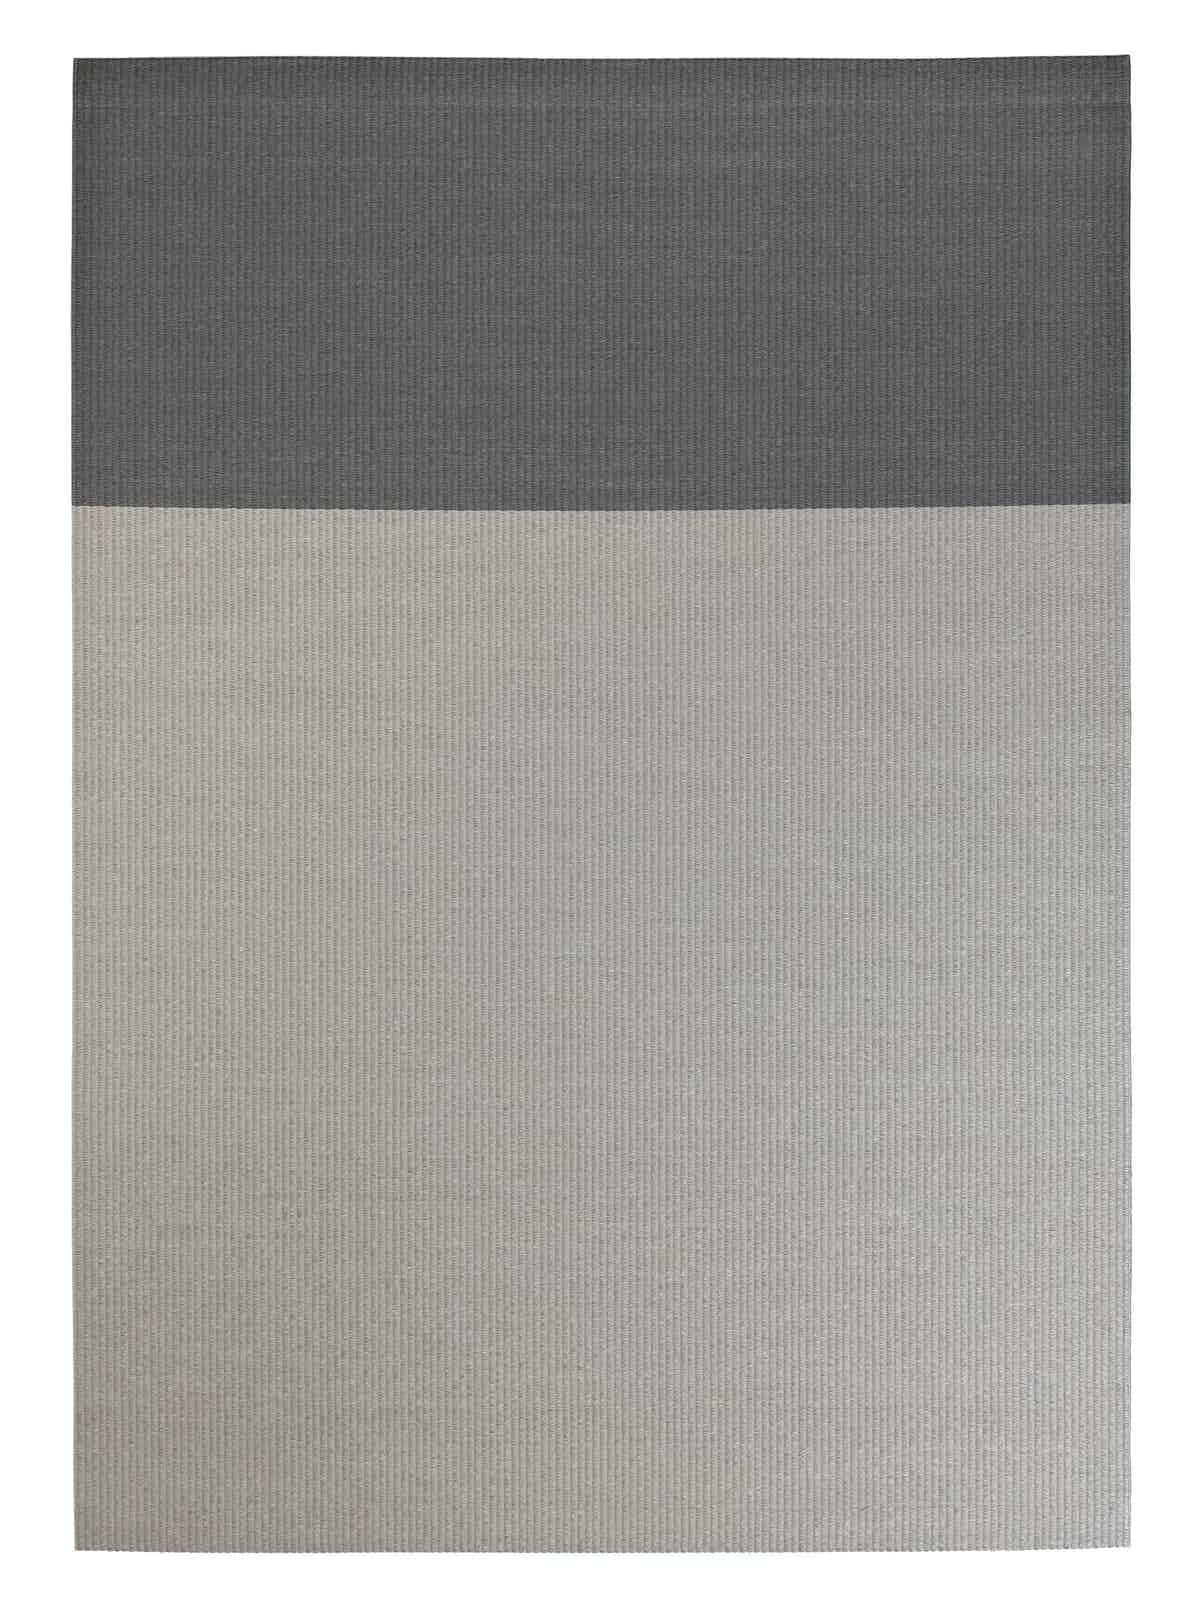 1383040 Beach Light Grey Graphite